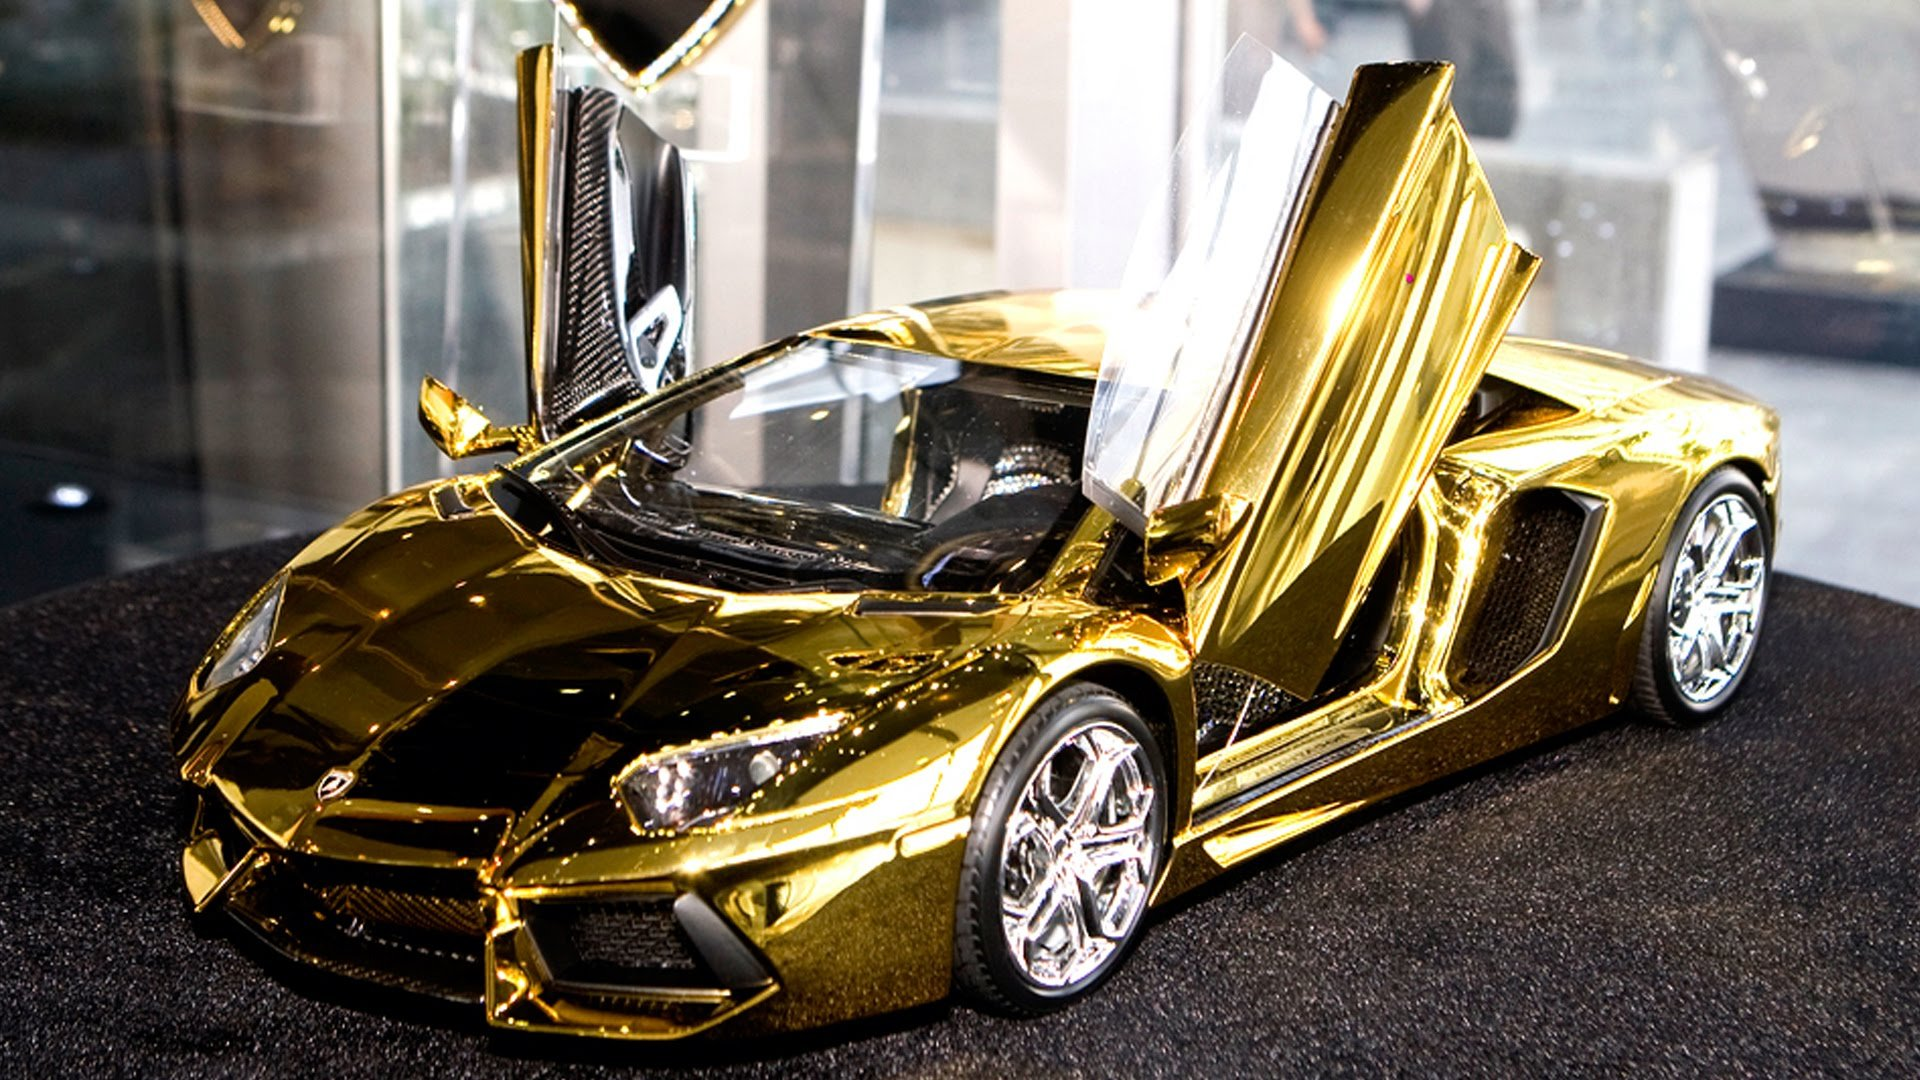 World Most Costly Car Wallpaper Gold Car Hd Wallpaper